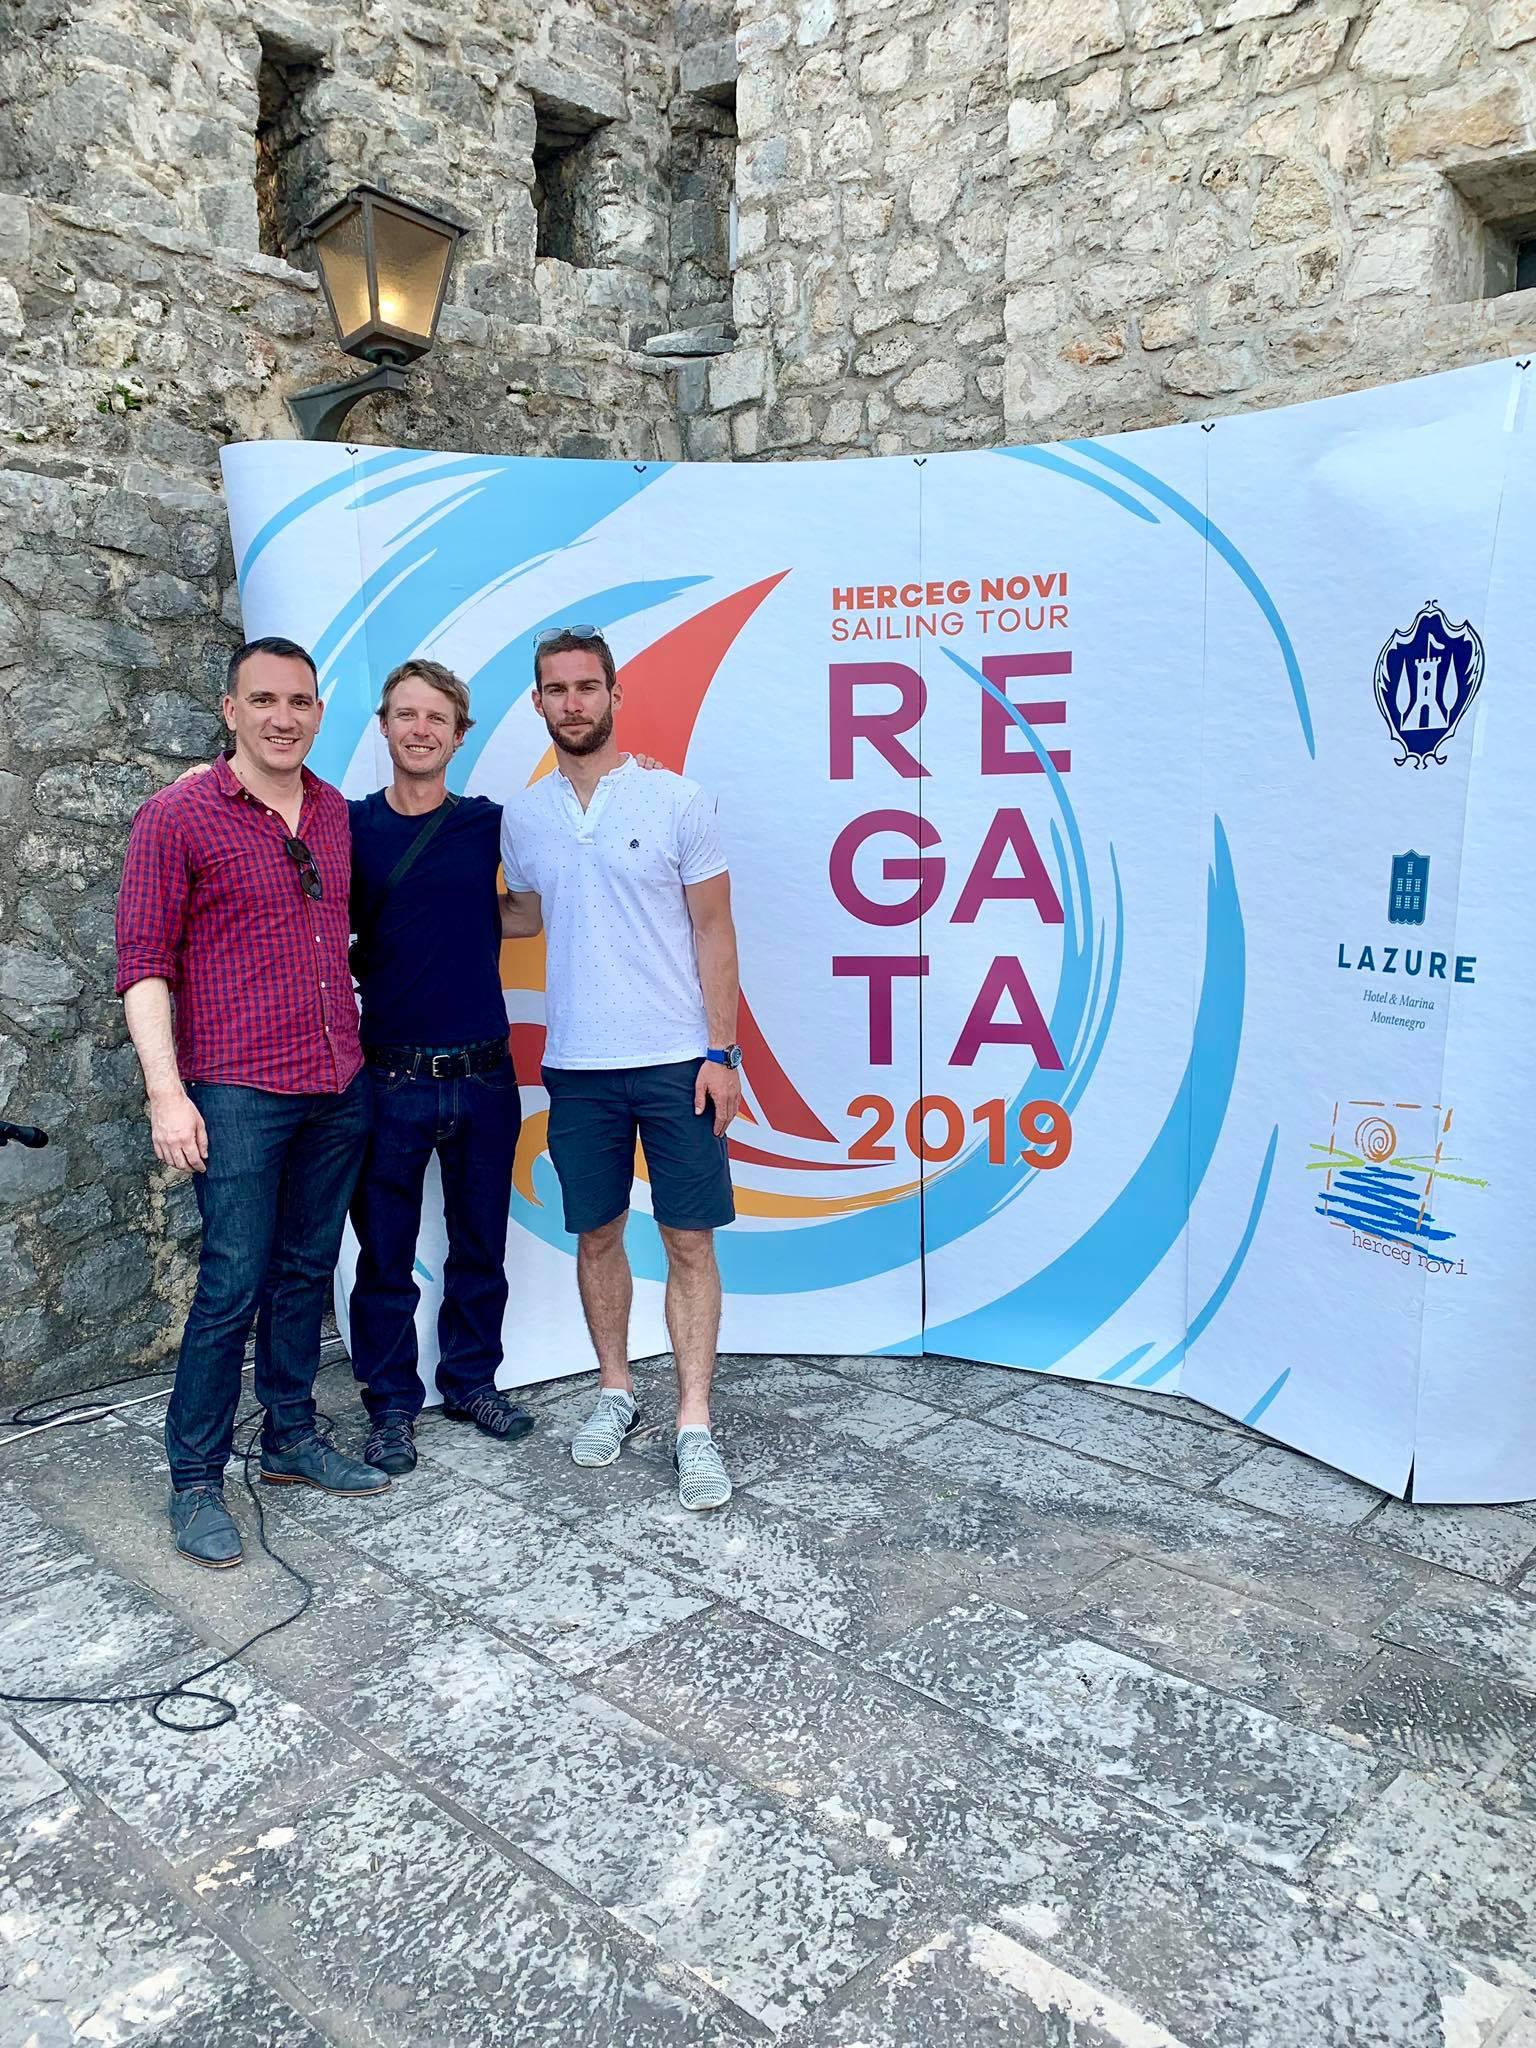 Expat Life in Montenegro Day 2 First full day in Herceg Novi16.jpg